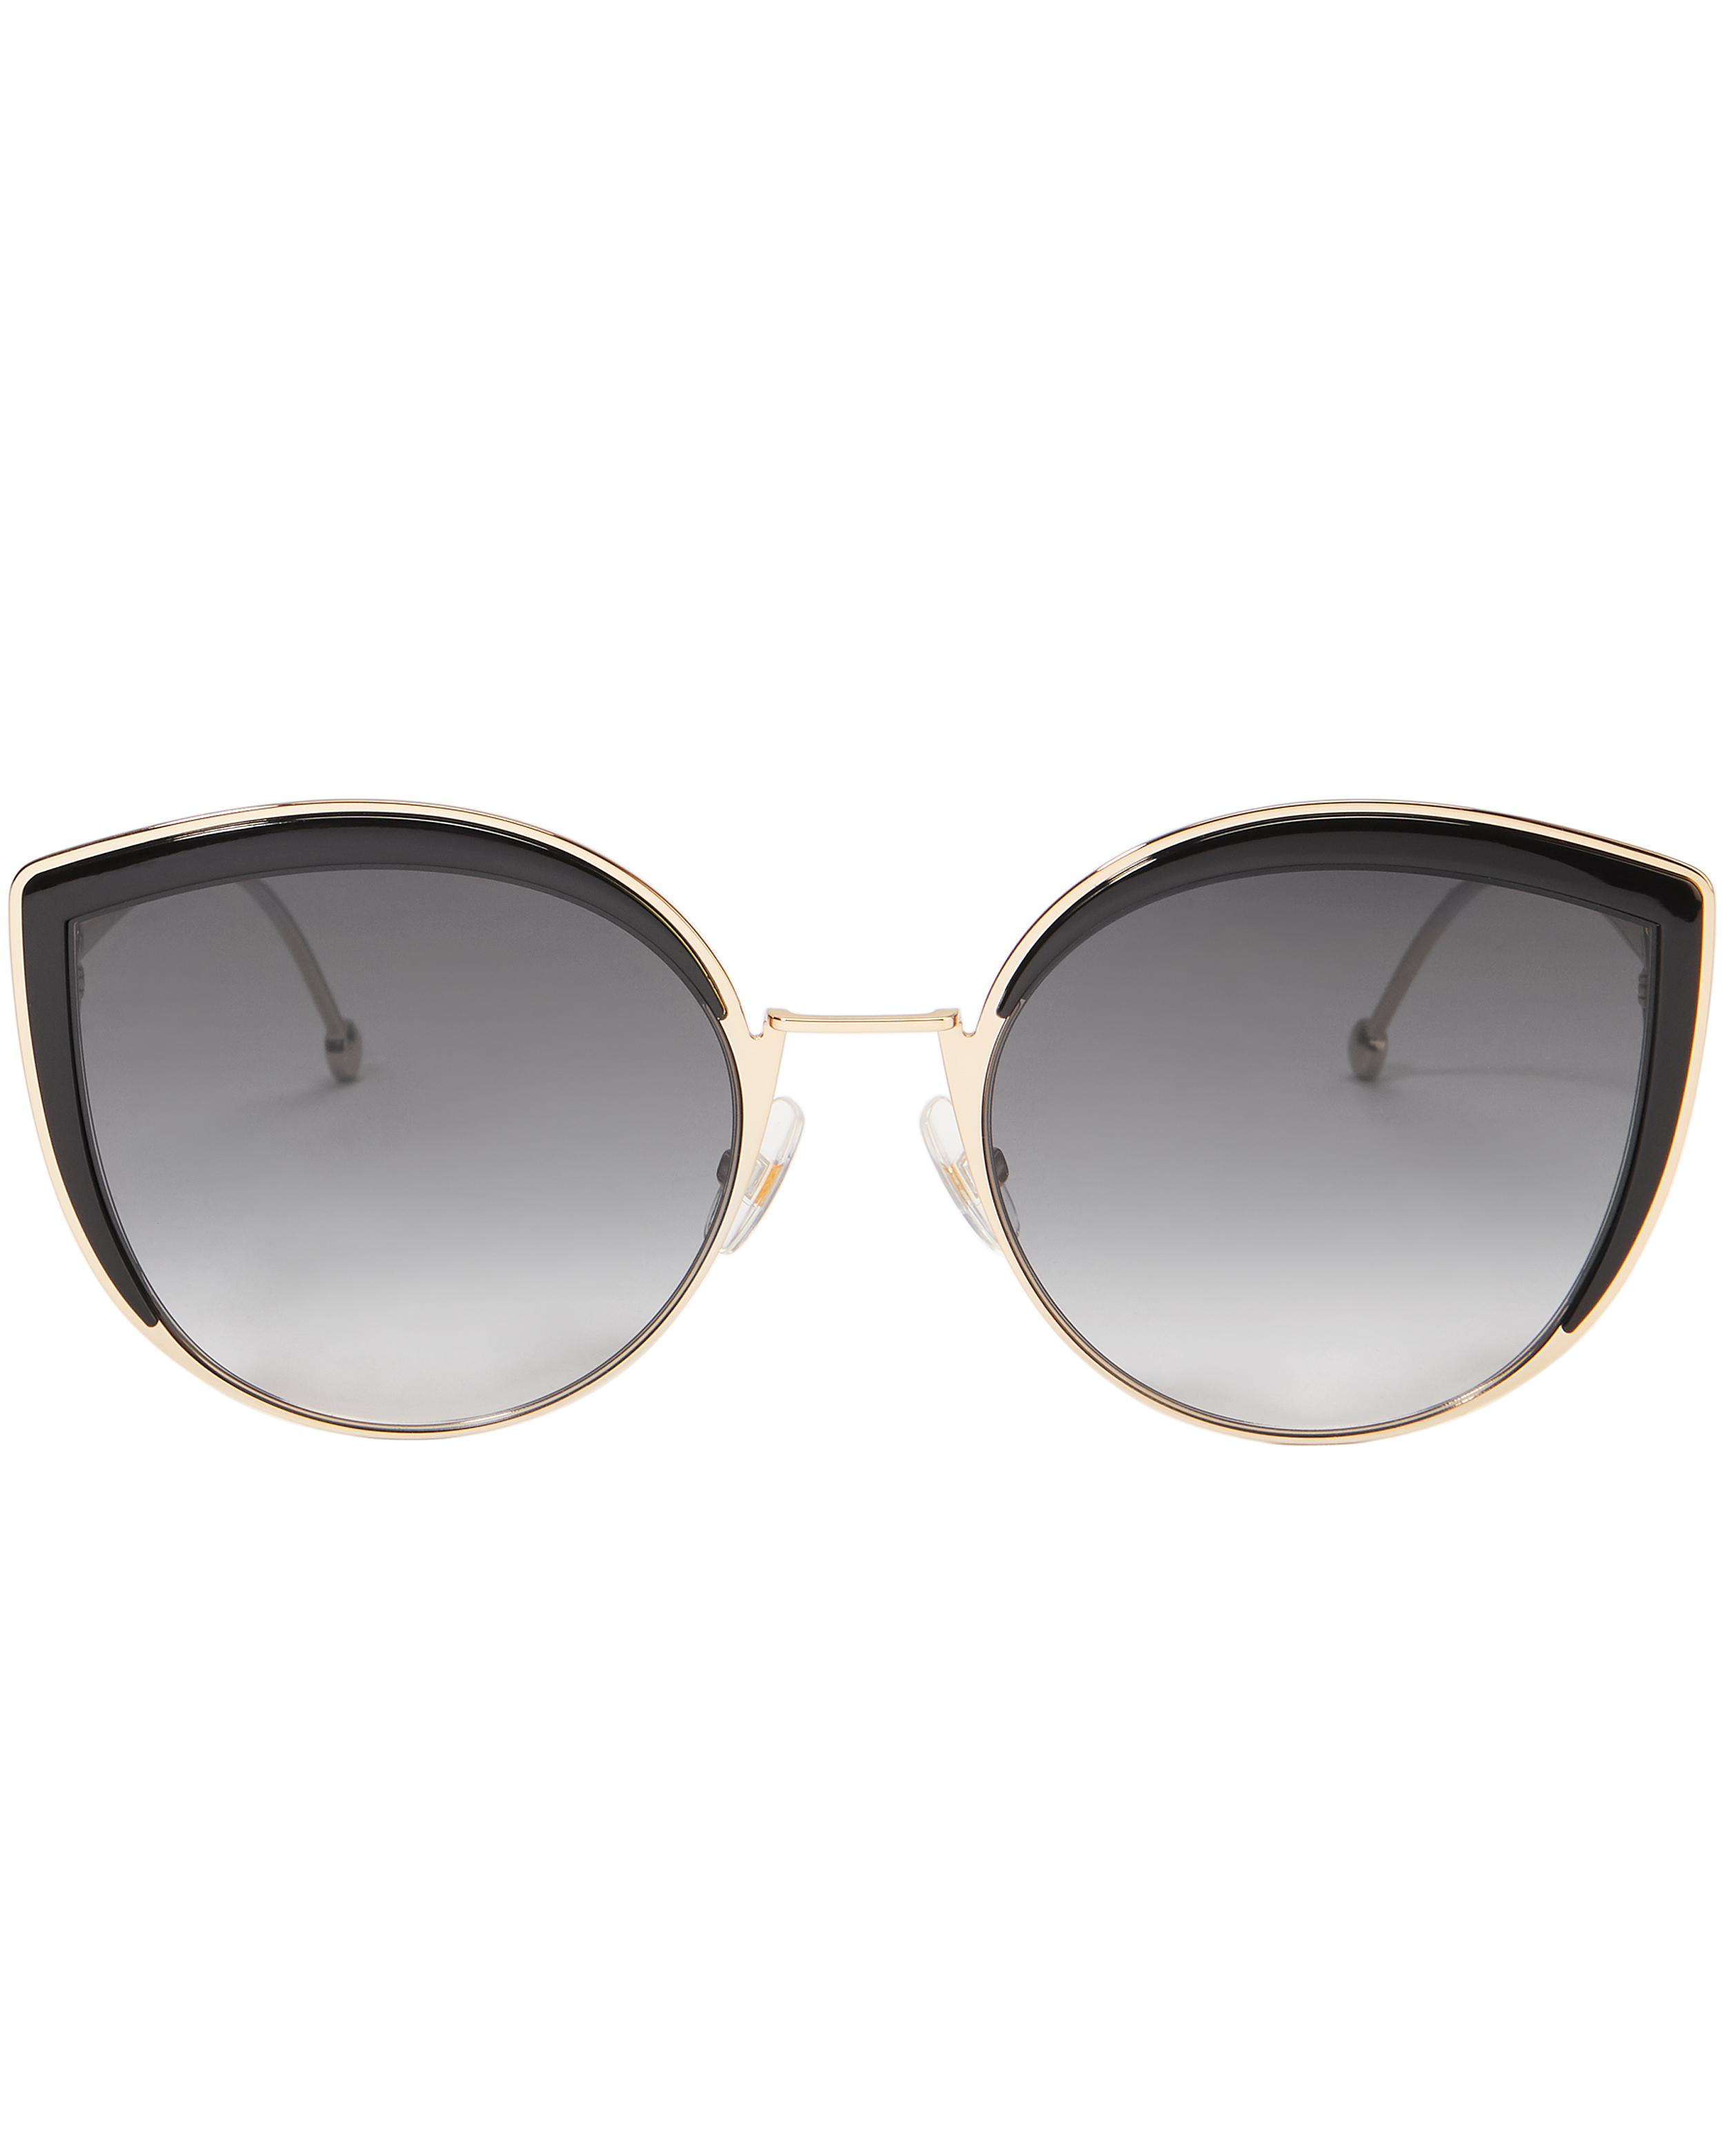 23598ba6285 Fendi Grey Gradient Cat Eye Sunglasses